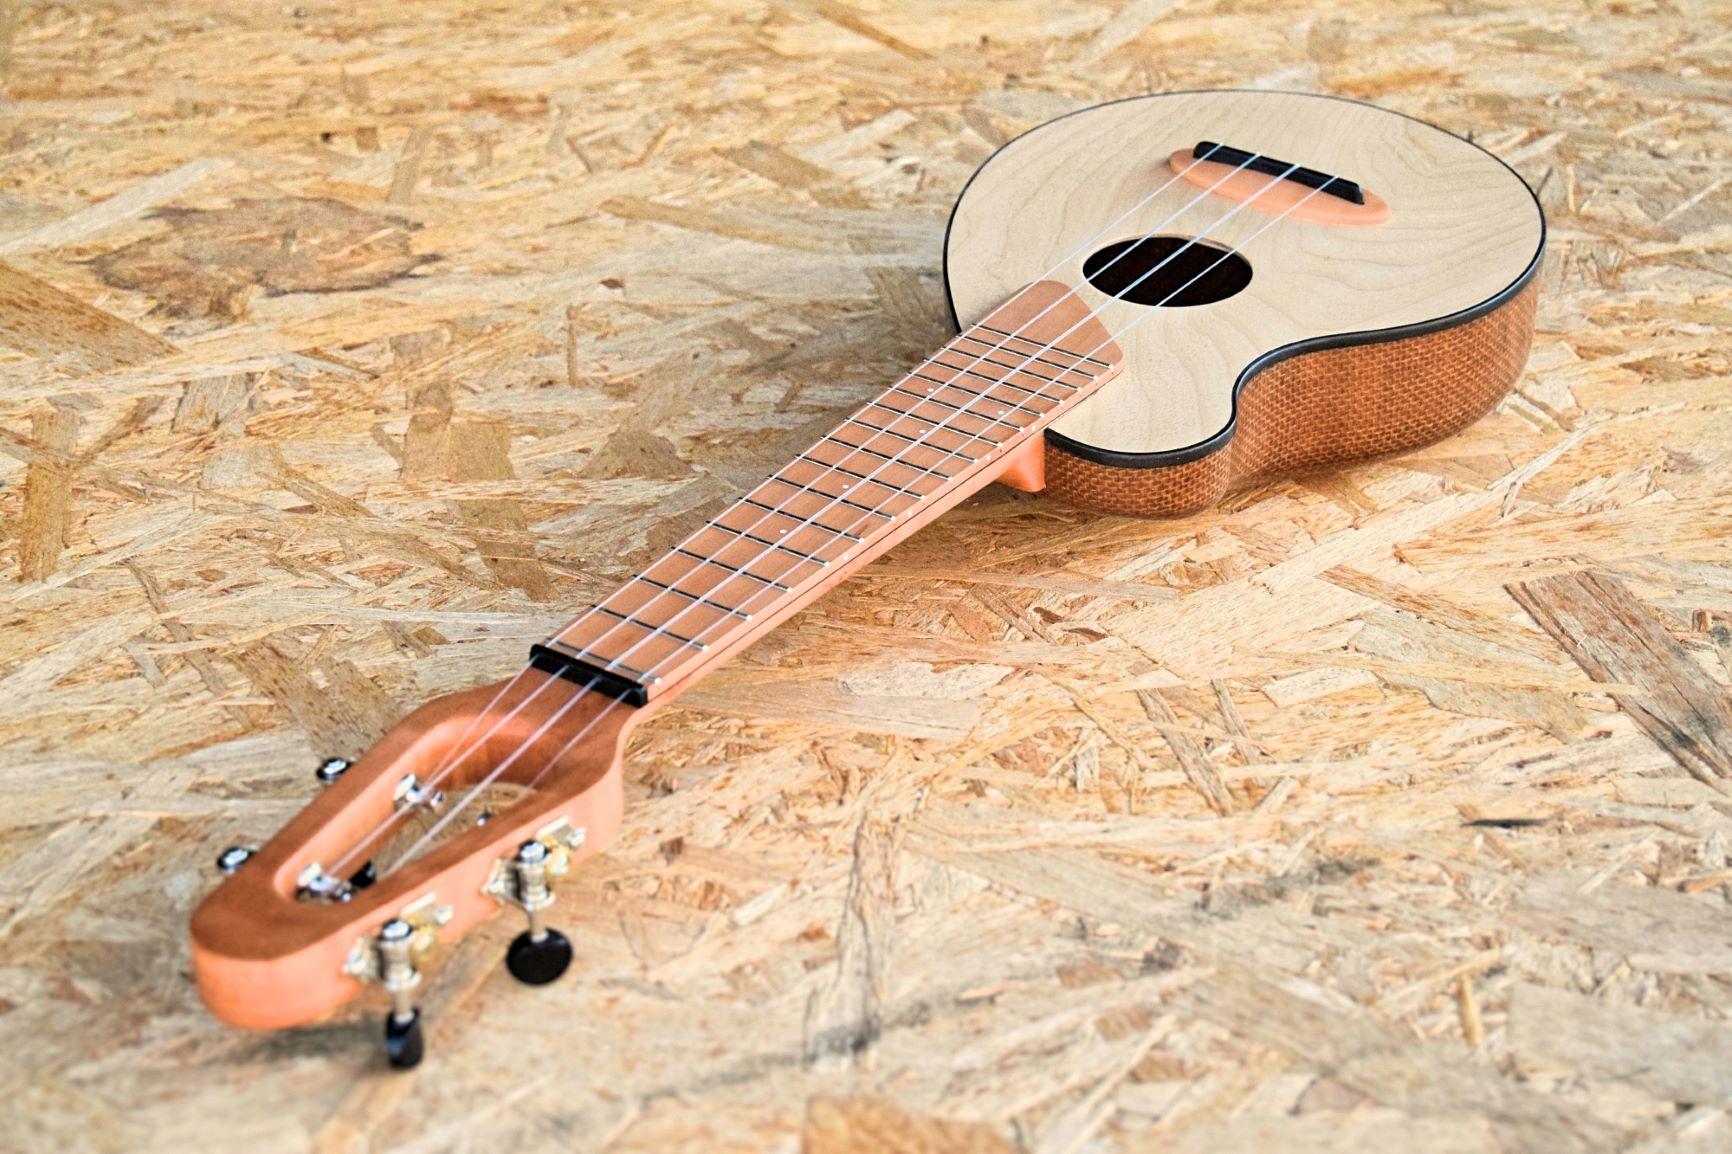 Sacco Biocomposite jute ukulele